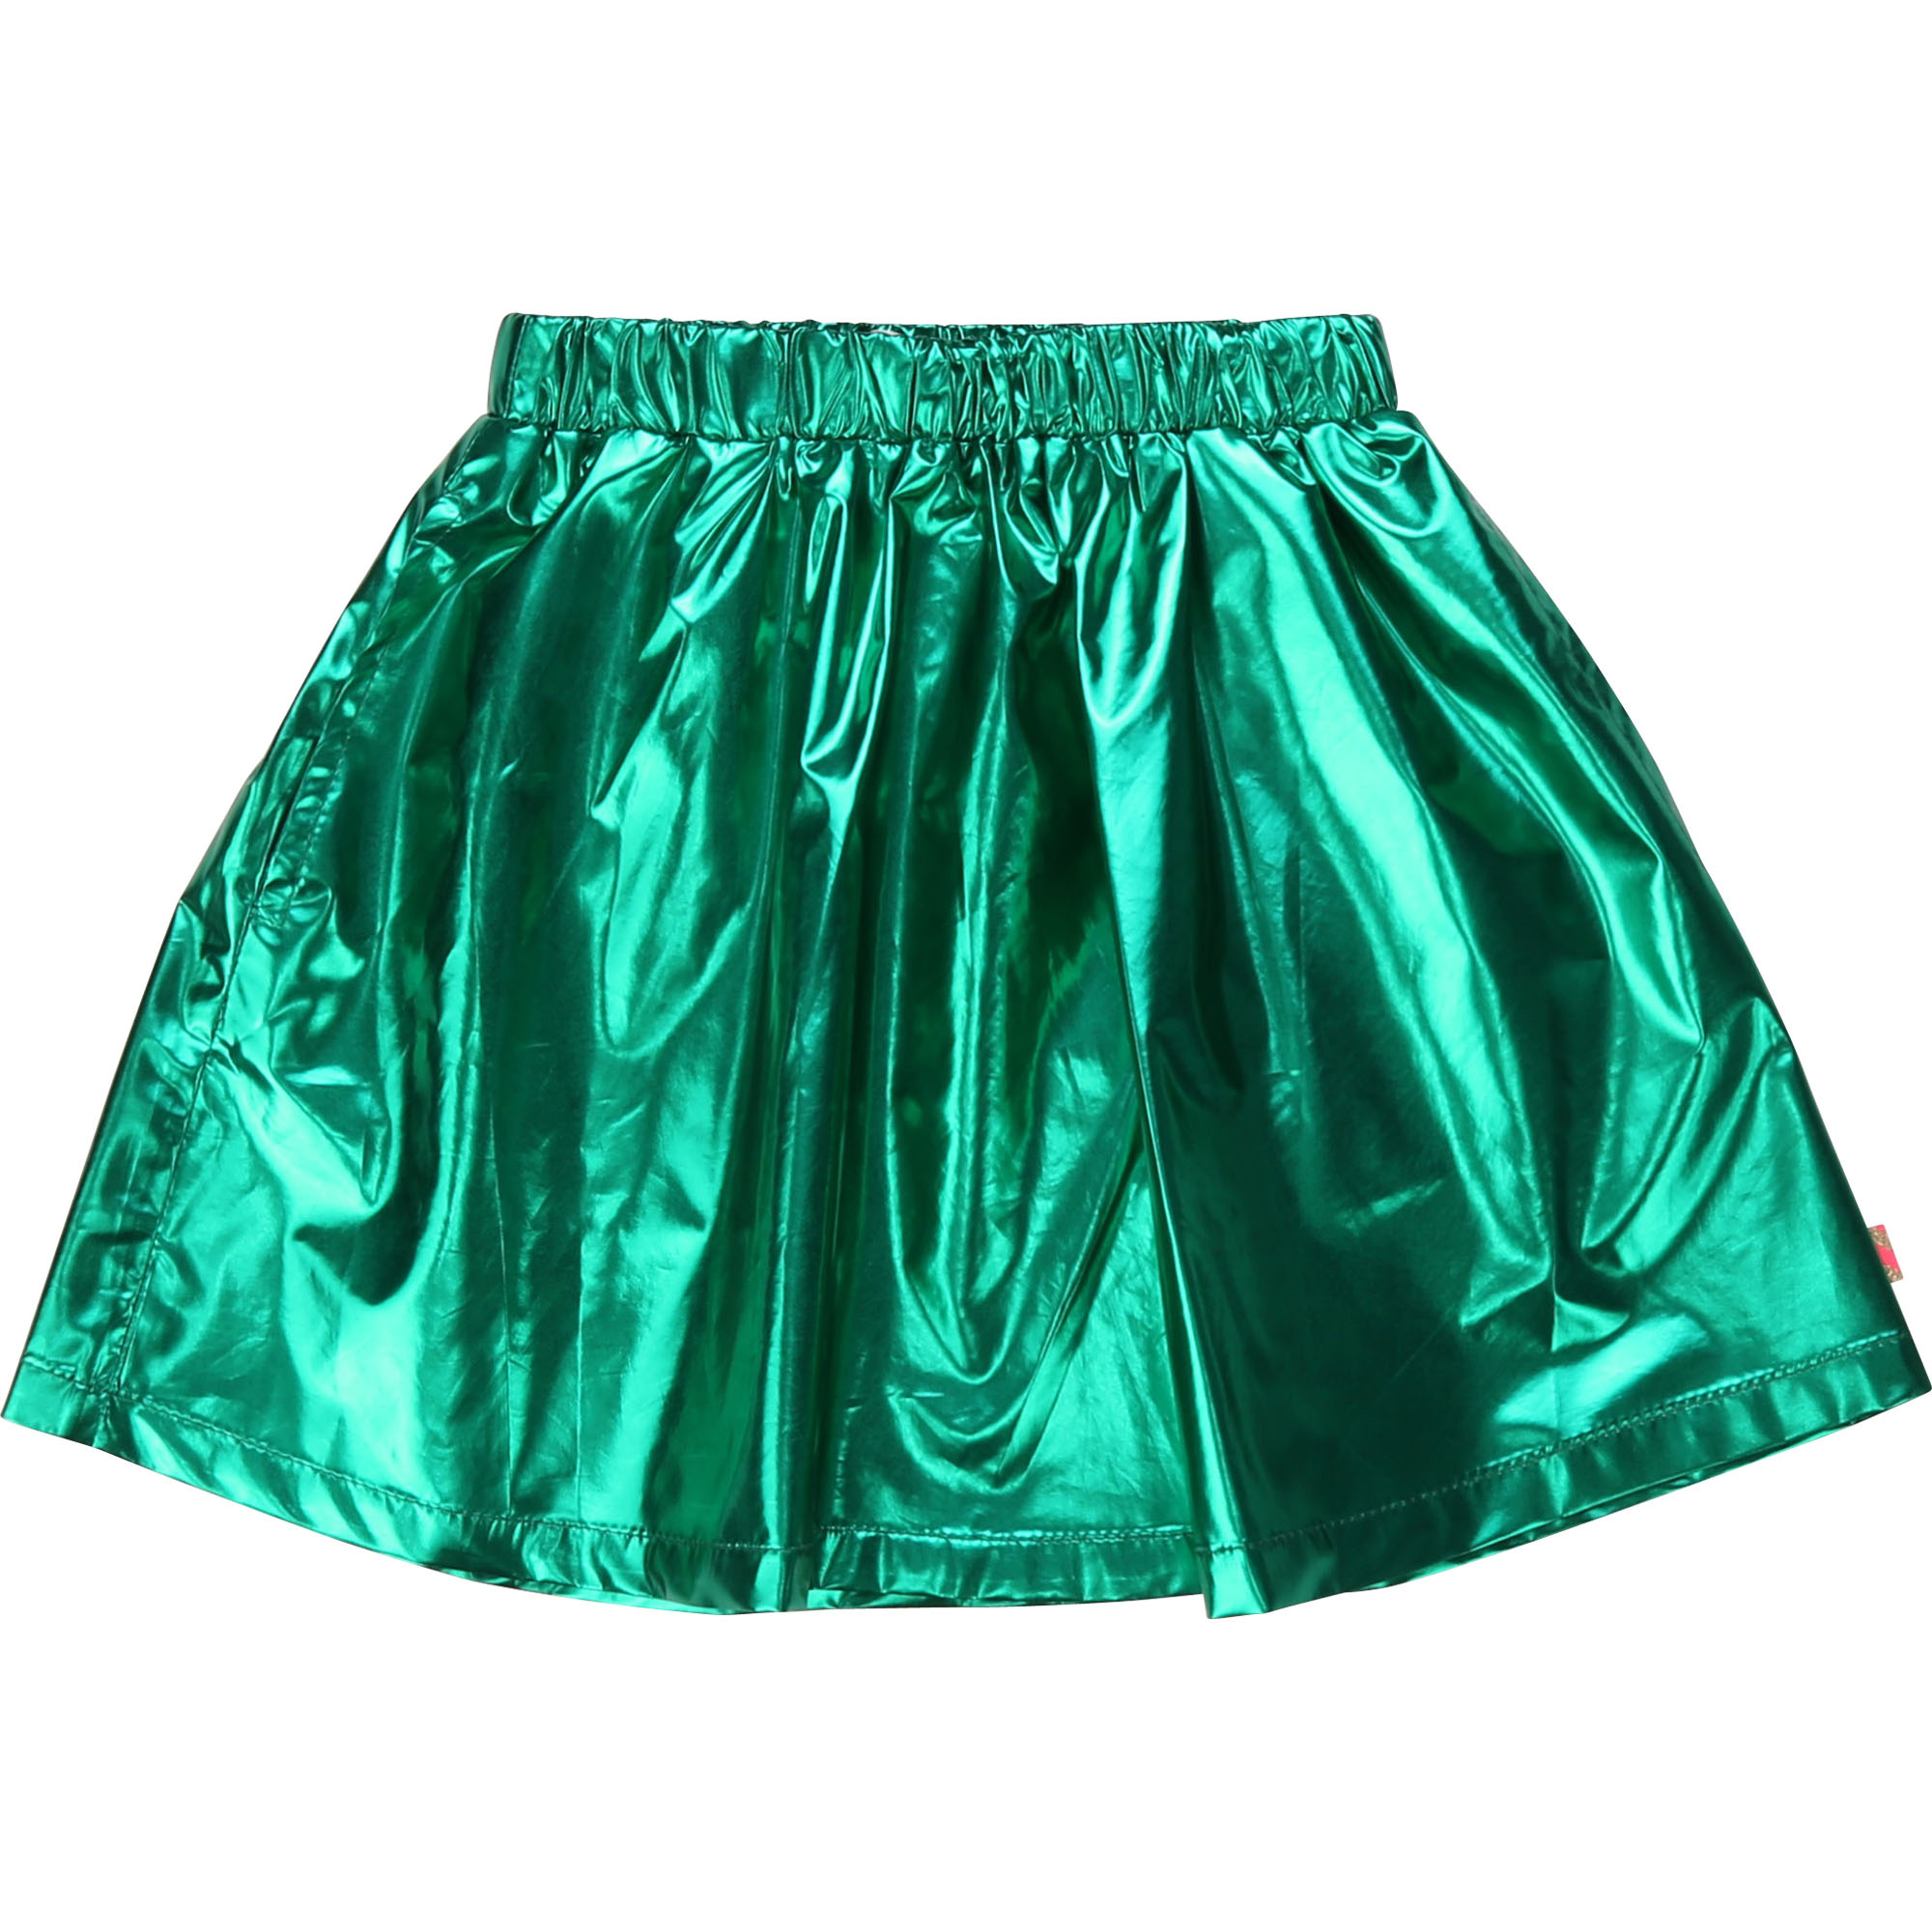 BILLIEBLUSH jupe courte métallisée-4